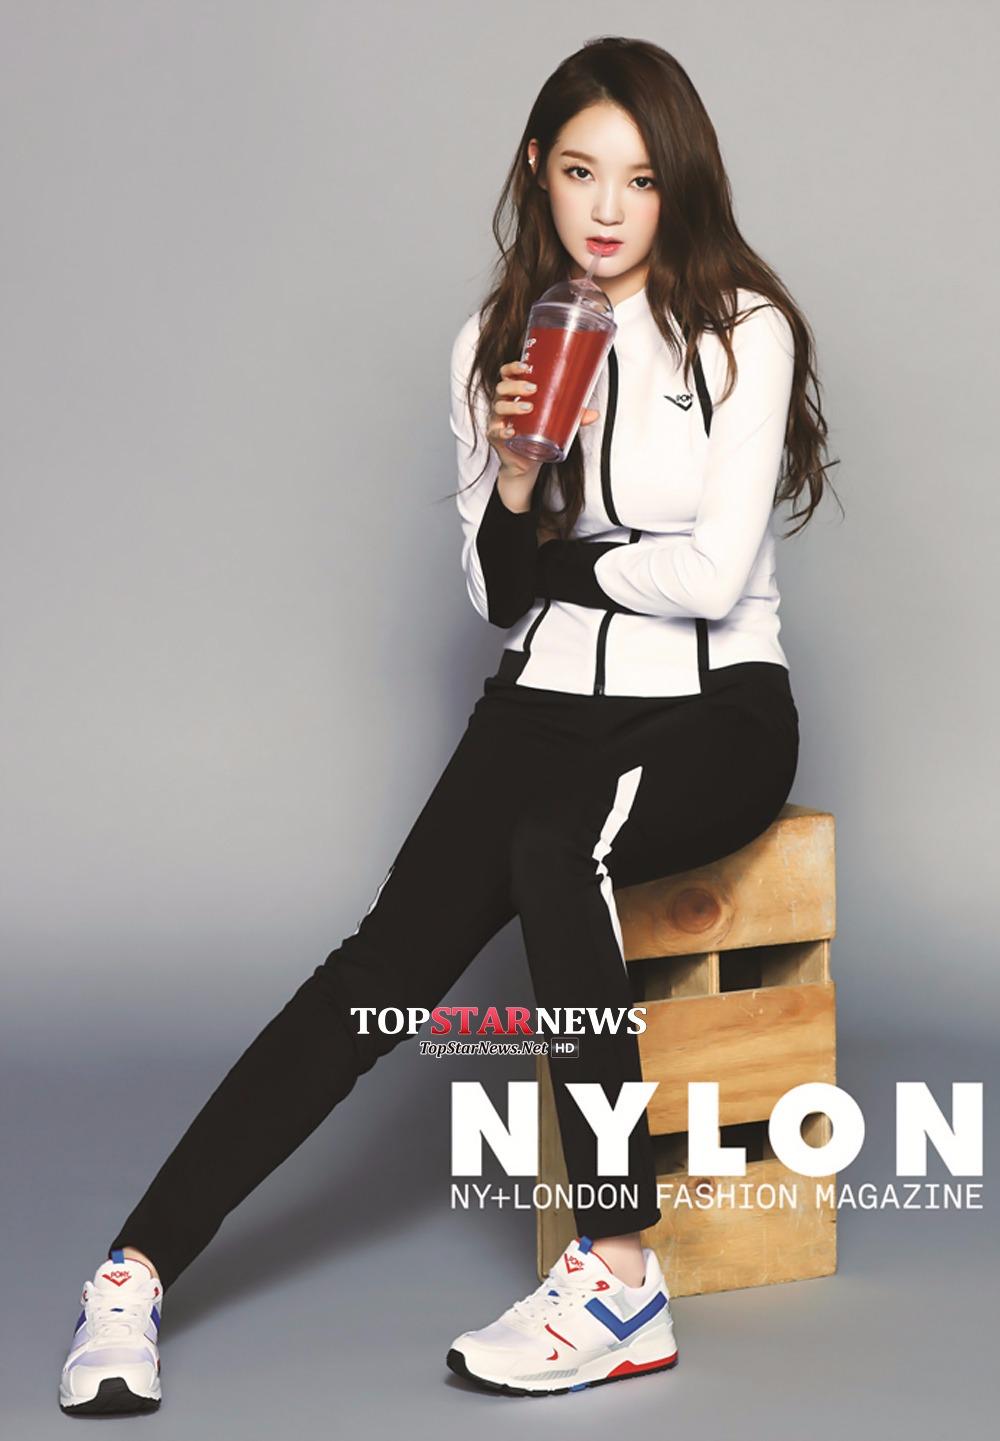 No.7 Davichi 姜珉耿 看到這份名單的第7名就是Davichi的姜珉耿,你一定會很驚訝,不是因為她上榜,而是因為她的身材竟然只能拍第7…到底前面是誰啊!雖然隊裡只有兩個人,而且也是走實力派女團路線,但姜珉耿絕對是和偶像團體門面比也不會輸的門面人選。